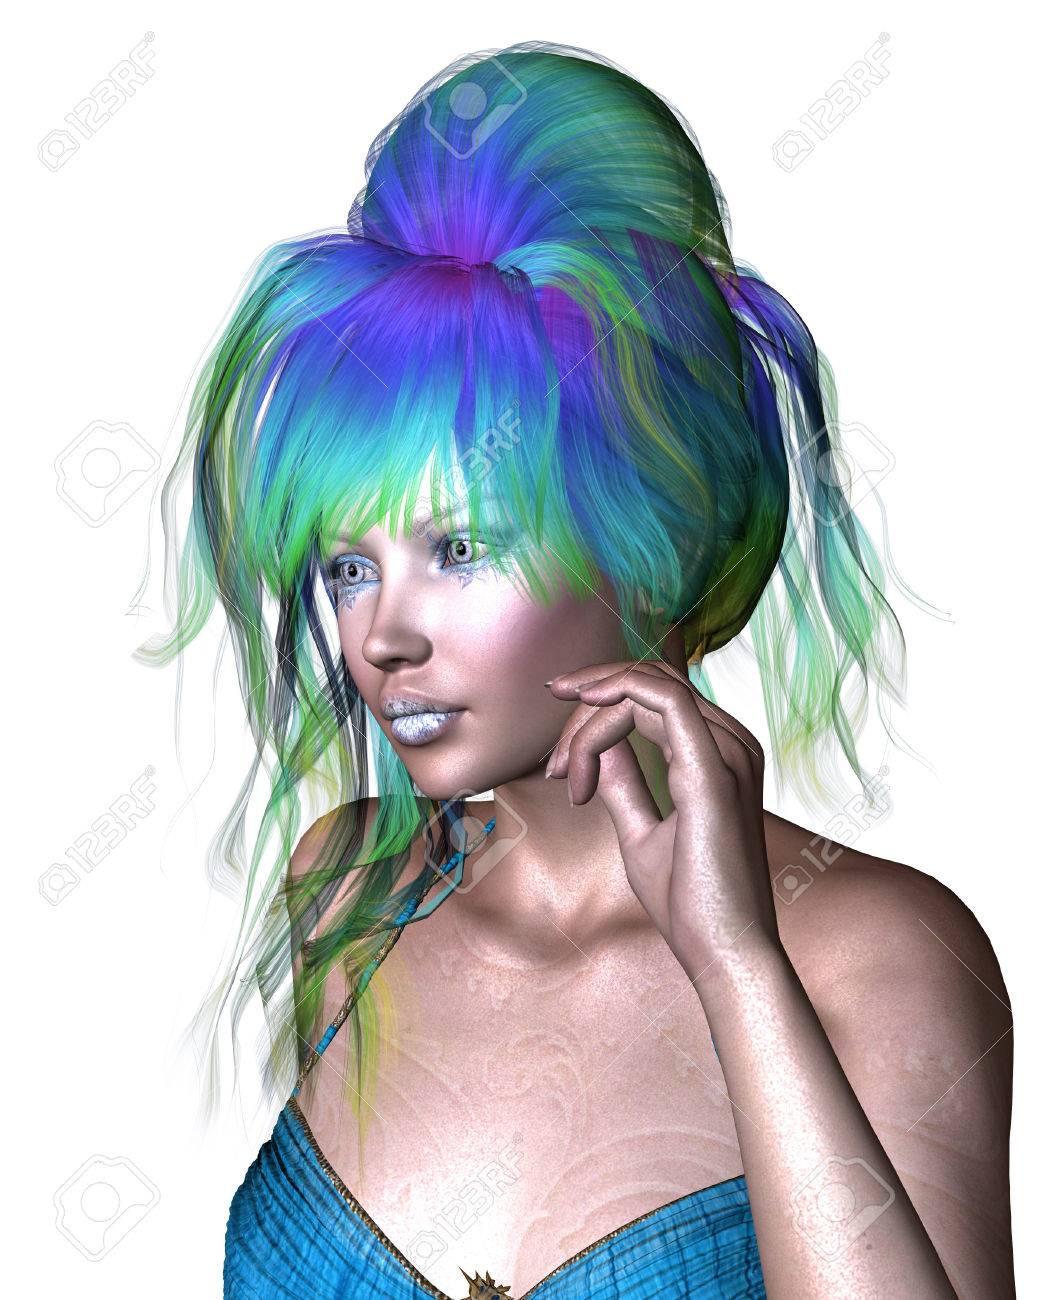 Blau grüne haare